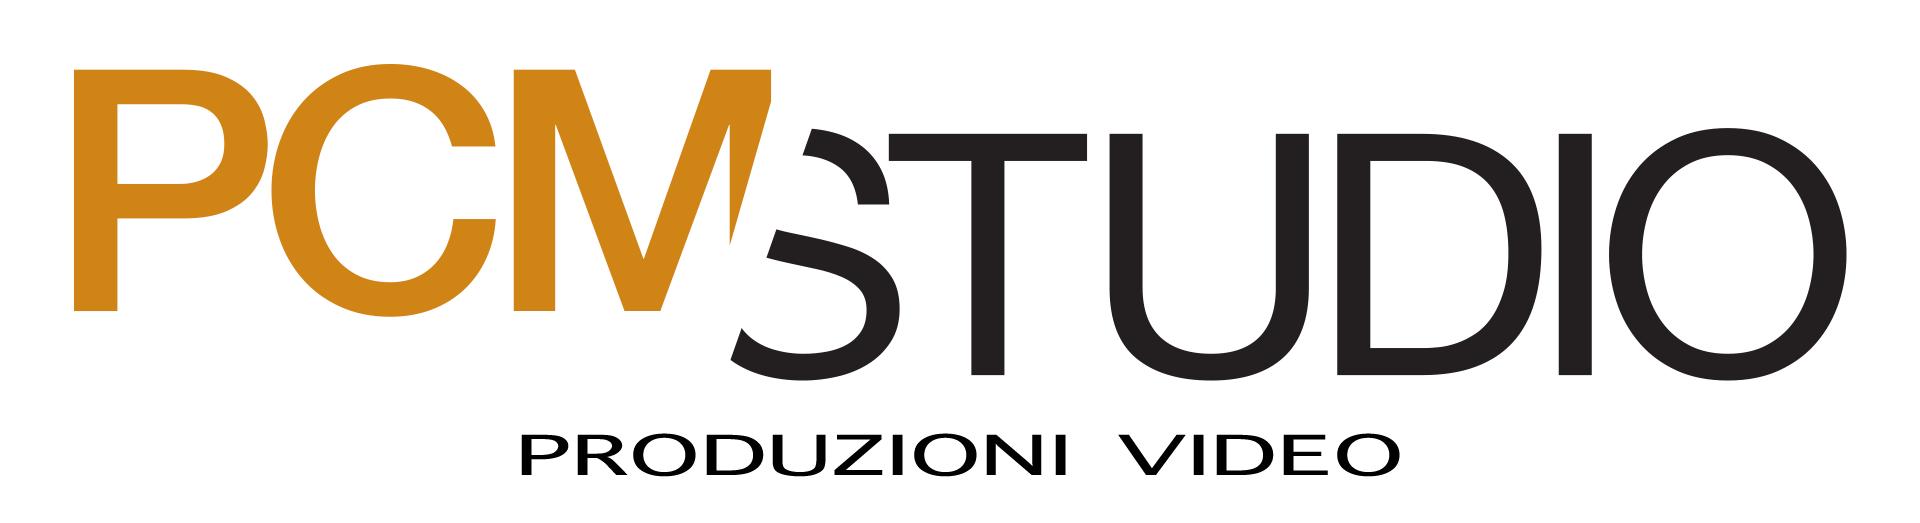 pcmstudio